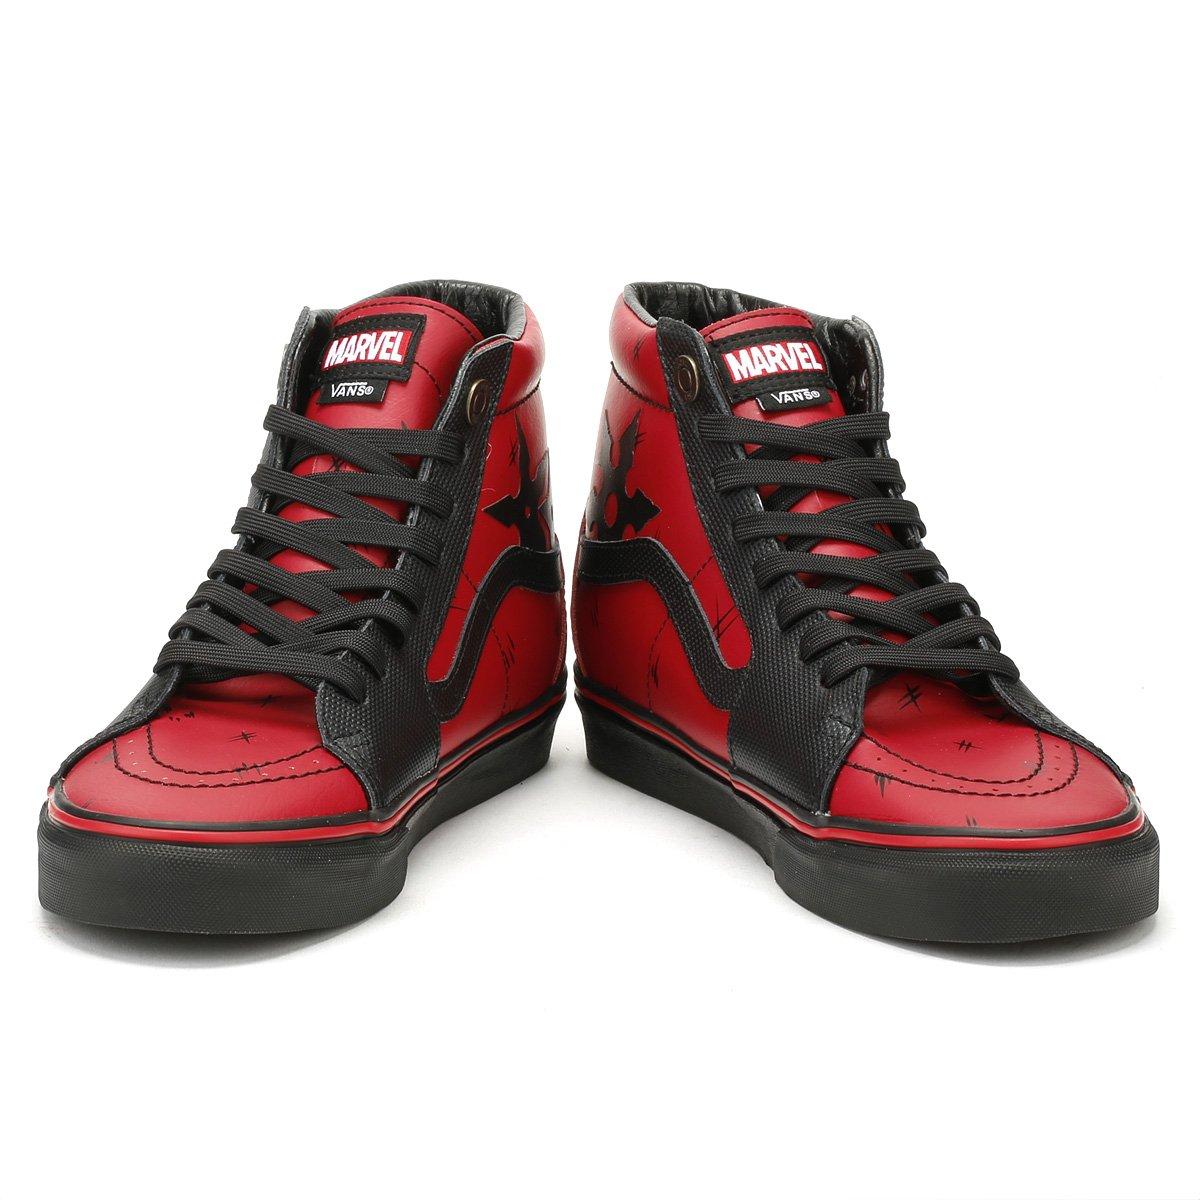 e2d3461877 Amazon.com  Vans SK8-Hi Marvel Deadpool Red Black Leather Skateboarding  Shoes  Shoes